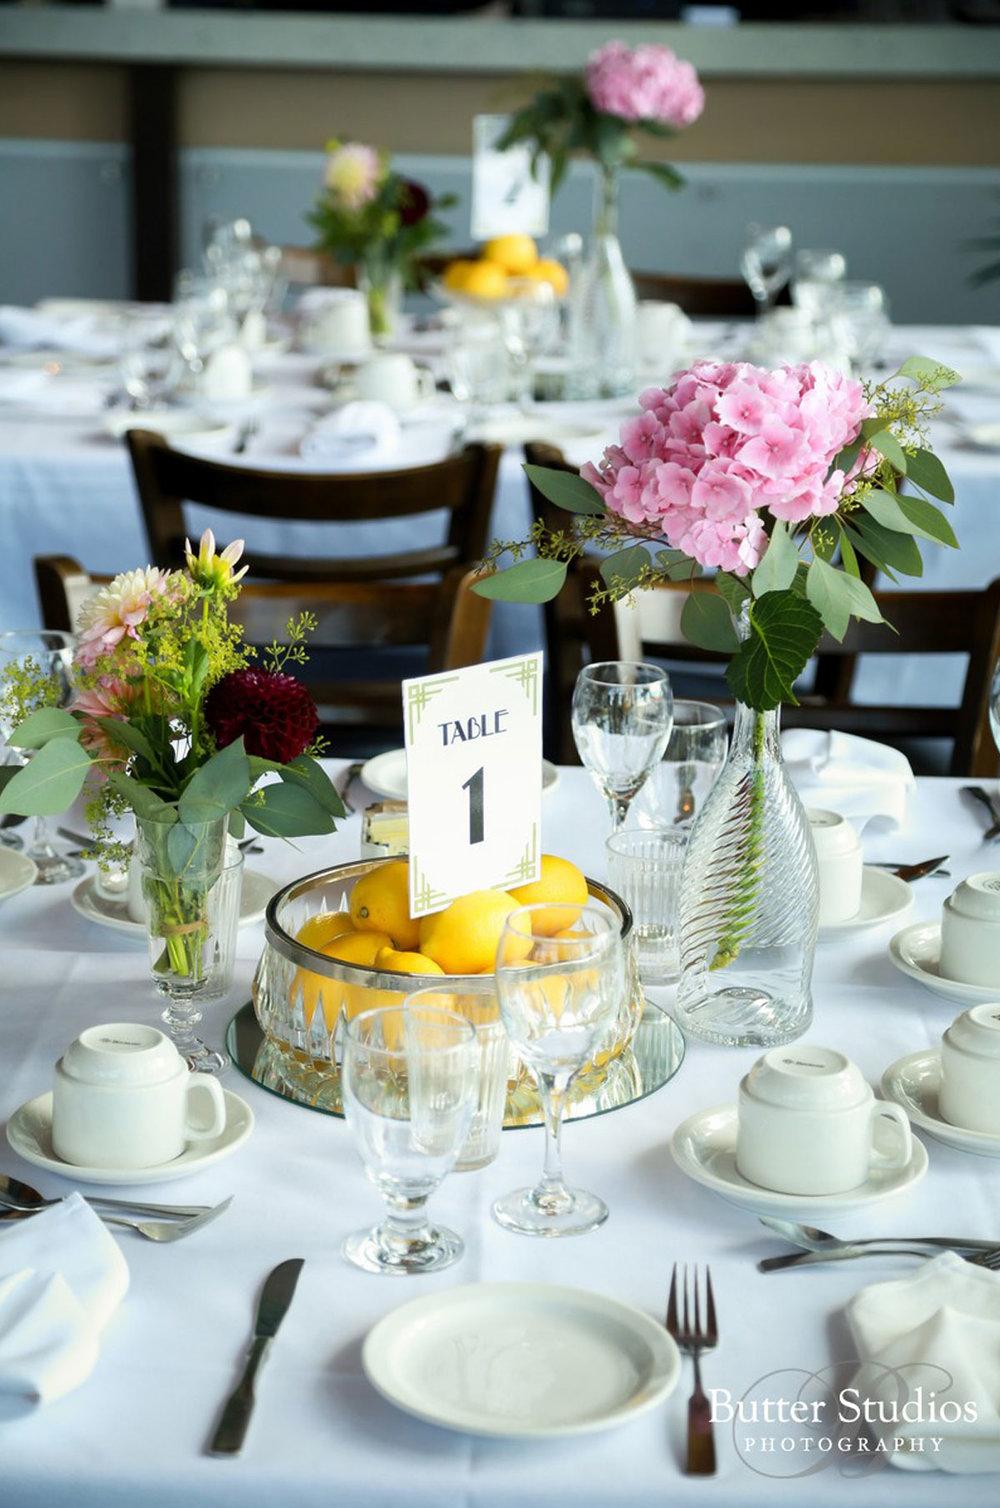 dloveaffair_wedding_tablescape_centerpiece.jpg